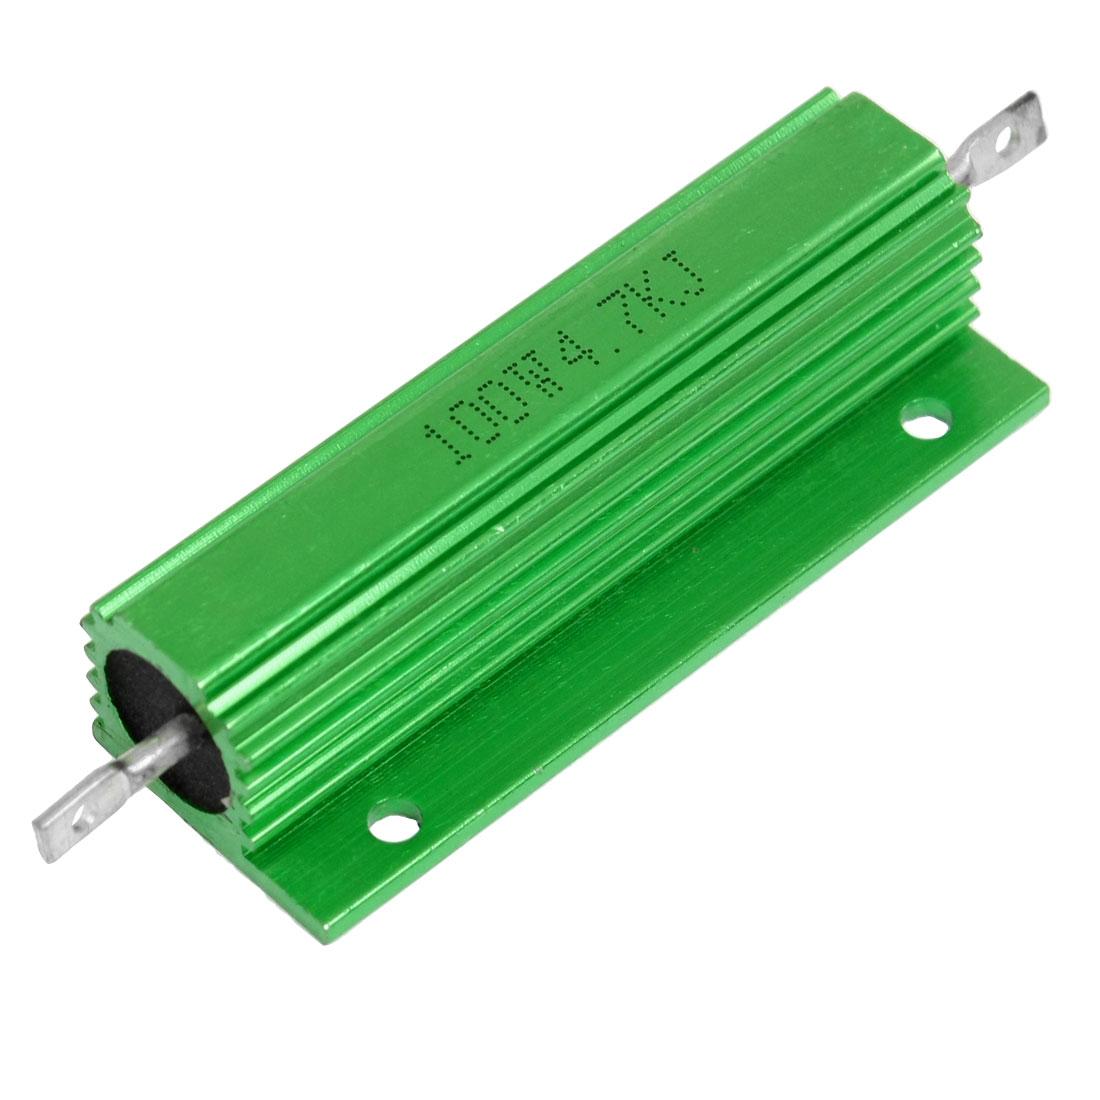 100W 4.7KJ Green Aluminum Shell Wirewound Housed Resistor